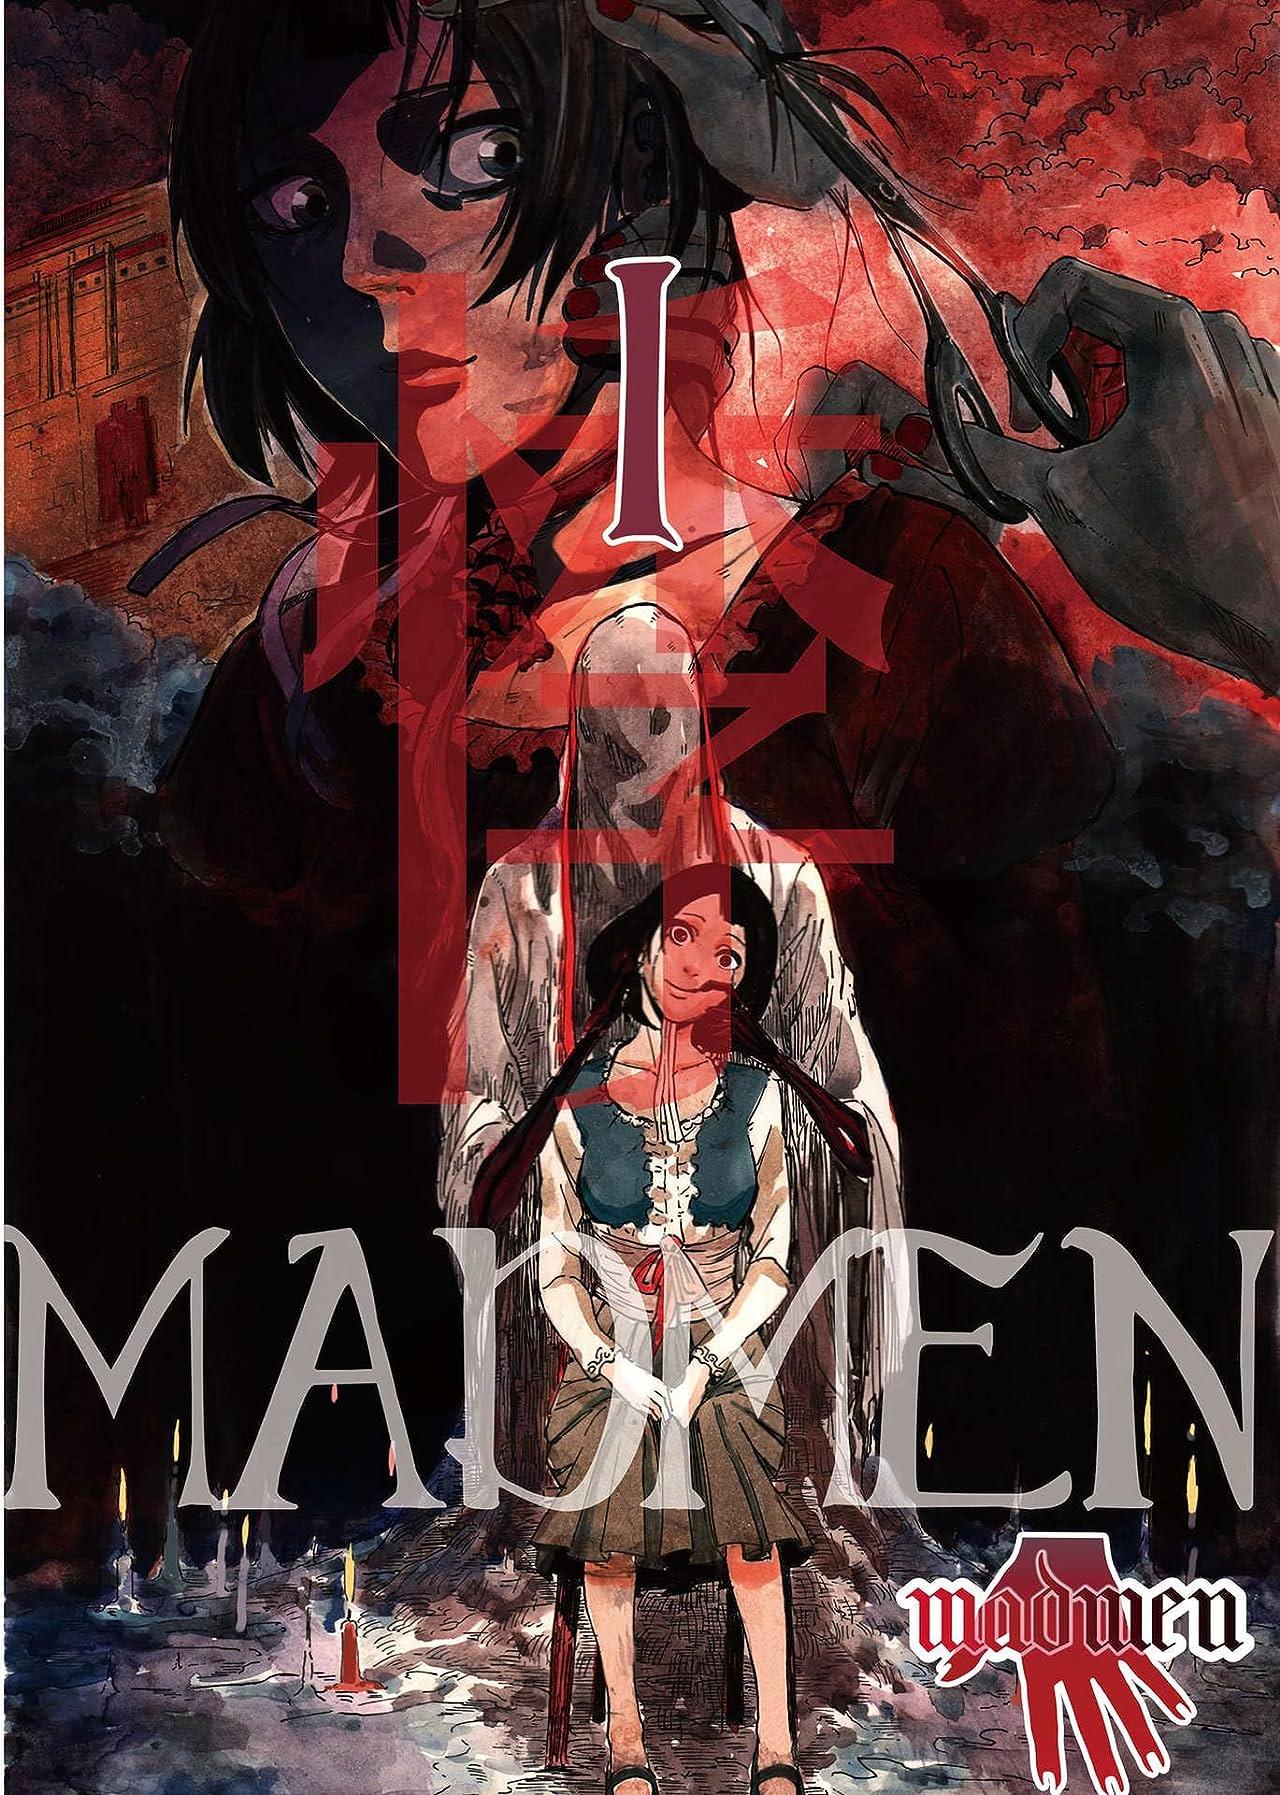 MADMEN #1